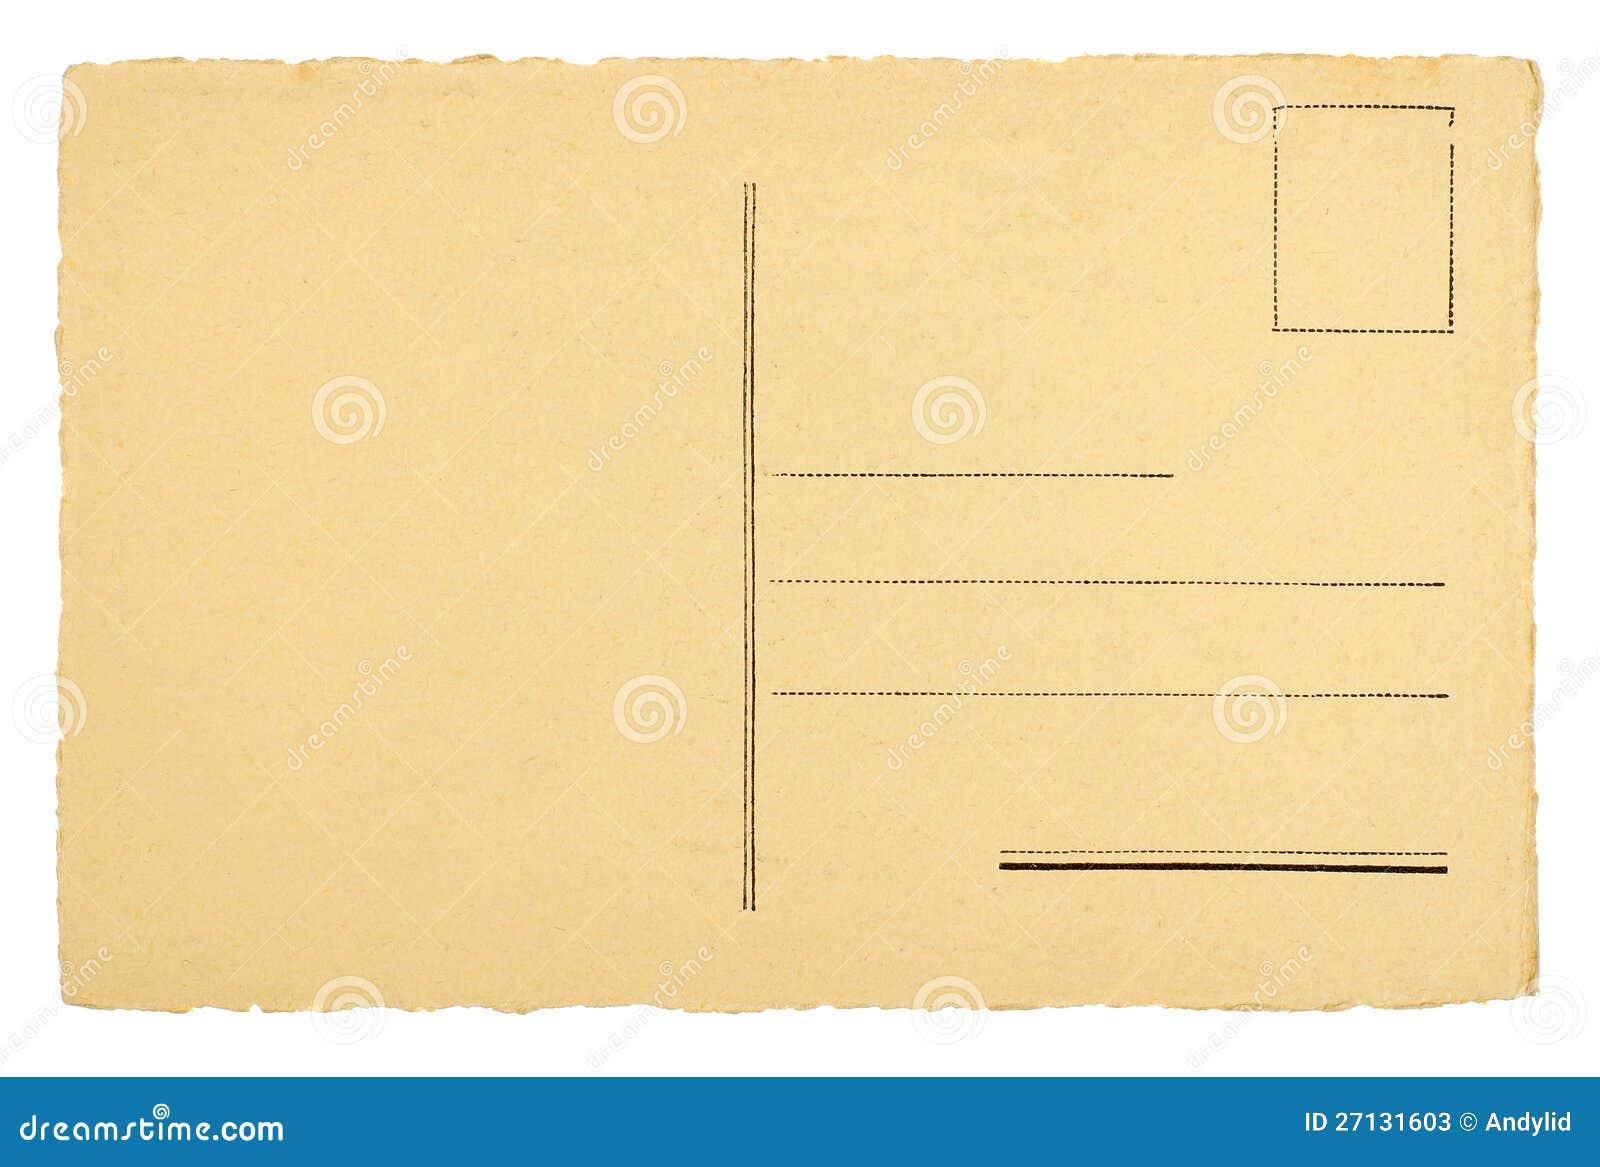 blank postcard stock images 35 098 photos